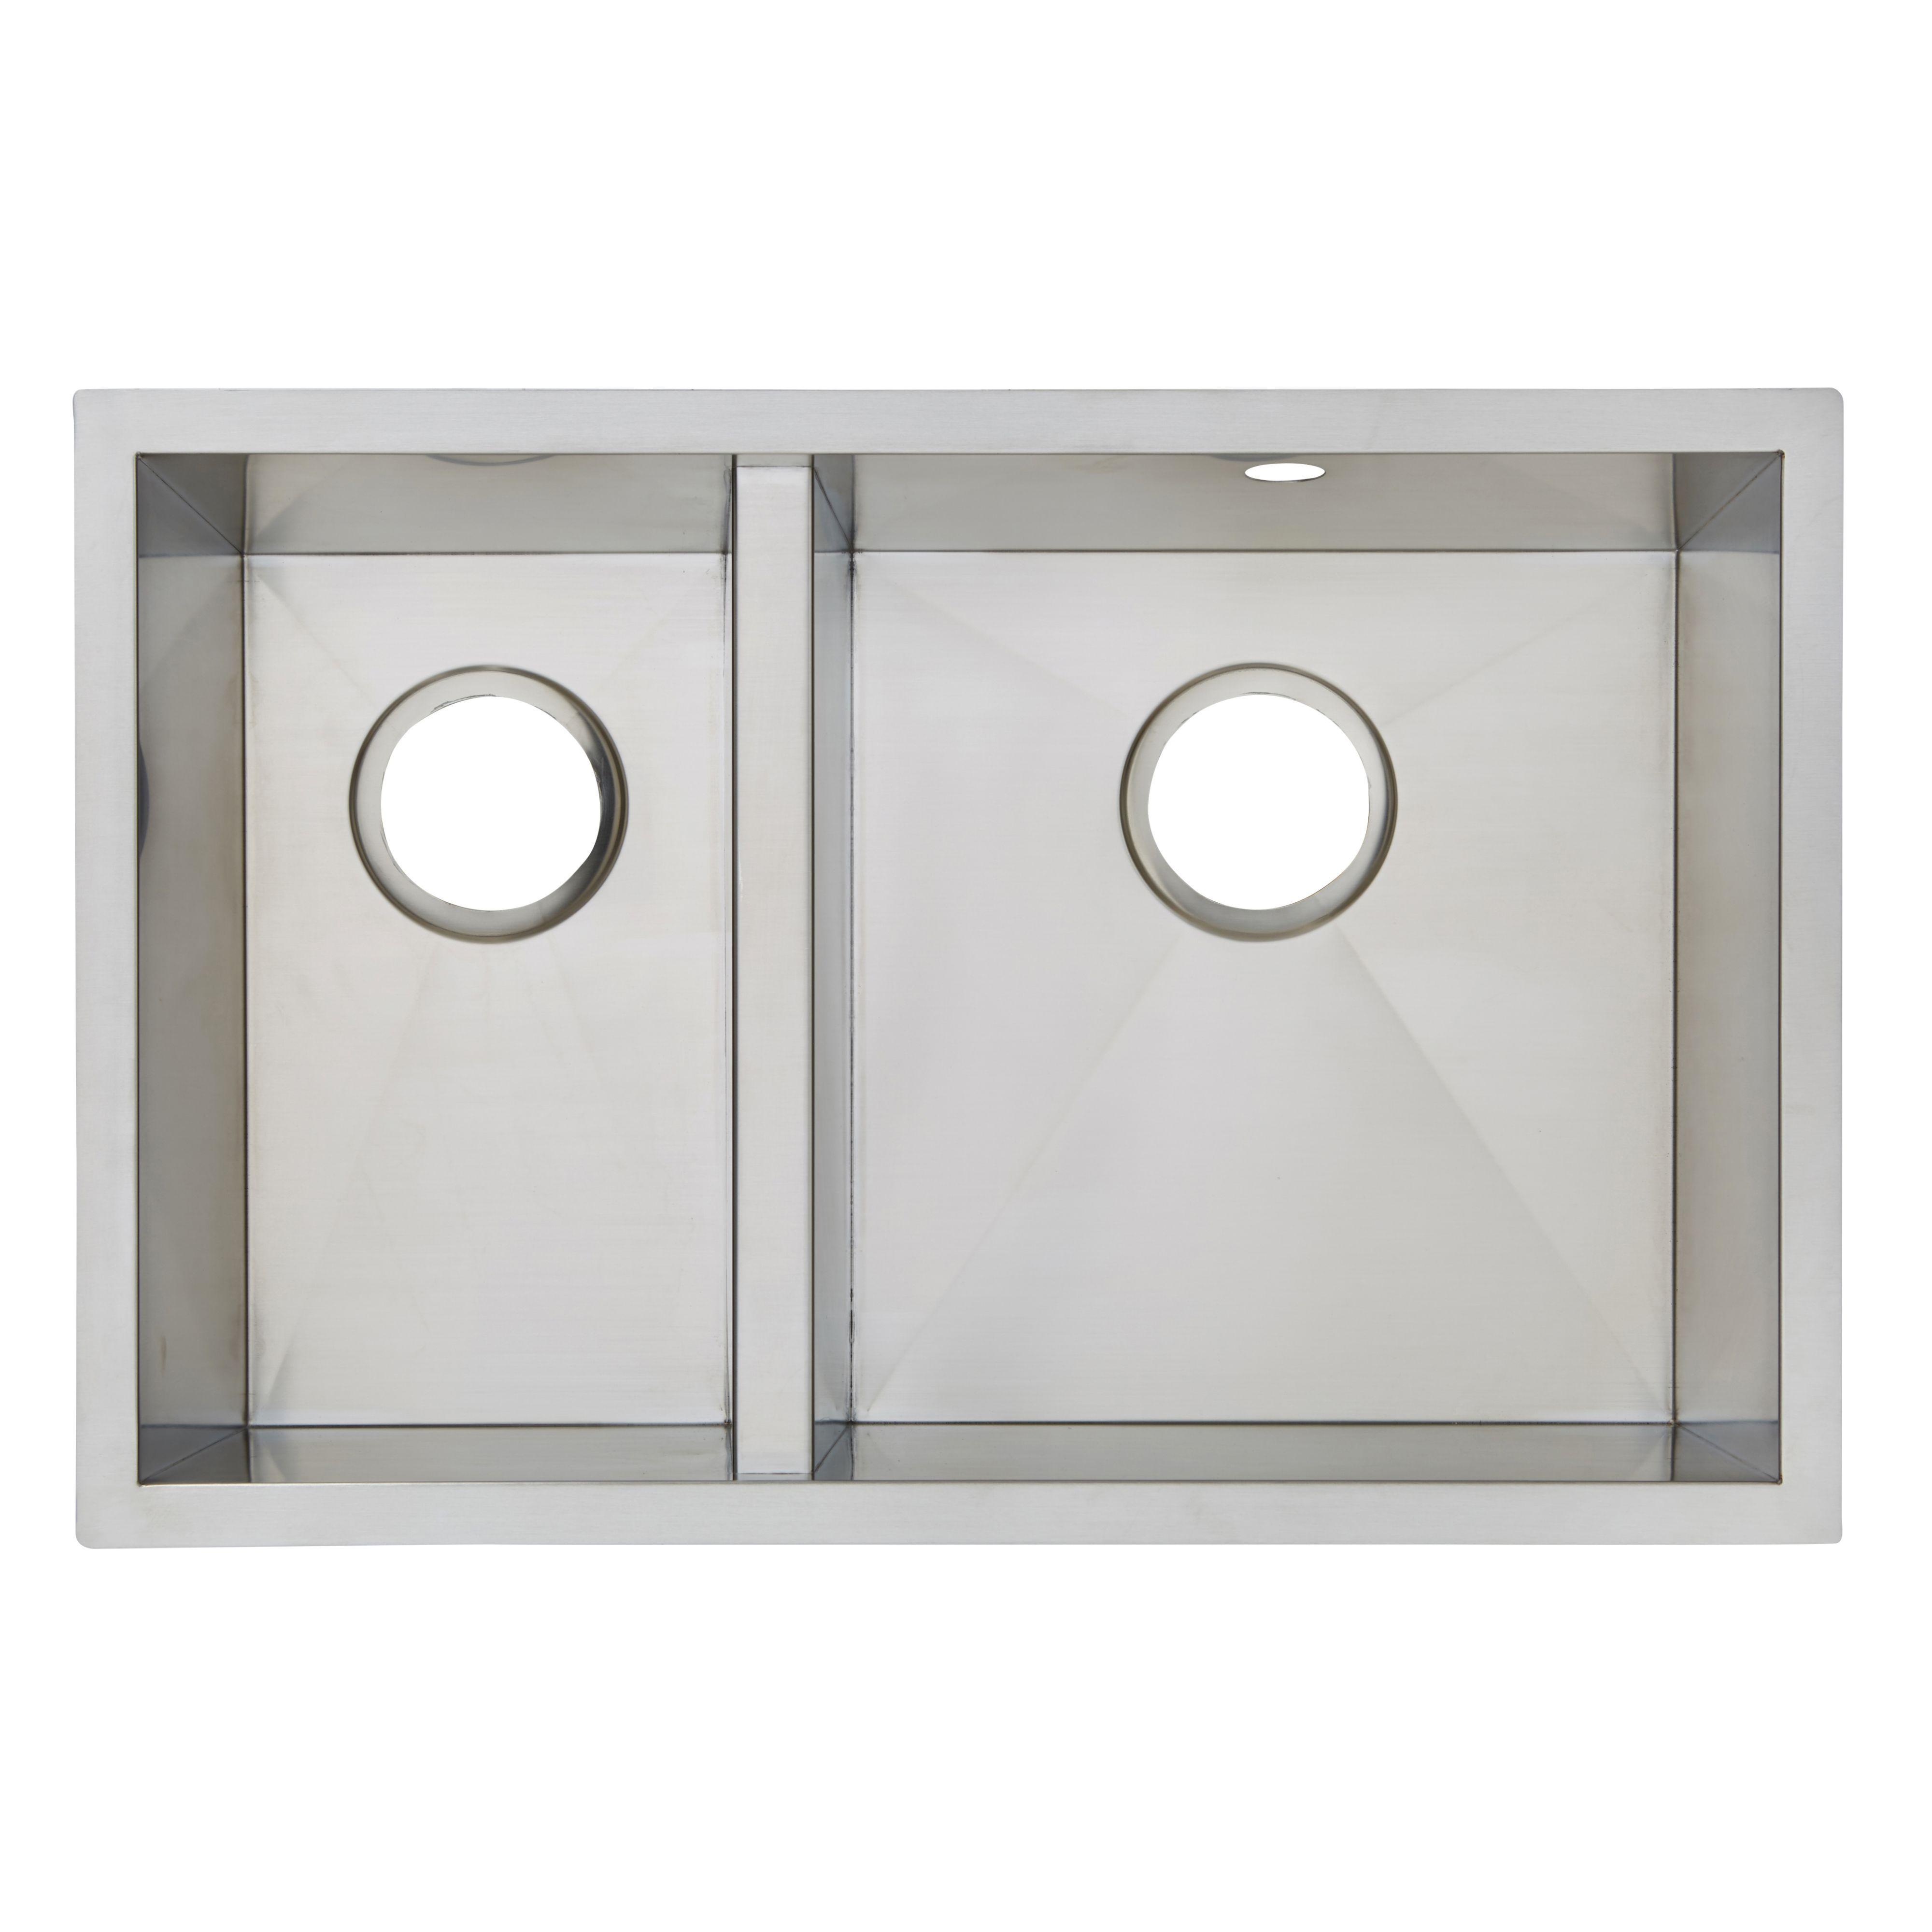 Cooke & Lewis Cajal 1.5 Bowl Brushed Stainless Steel Sink | kitchen ...